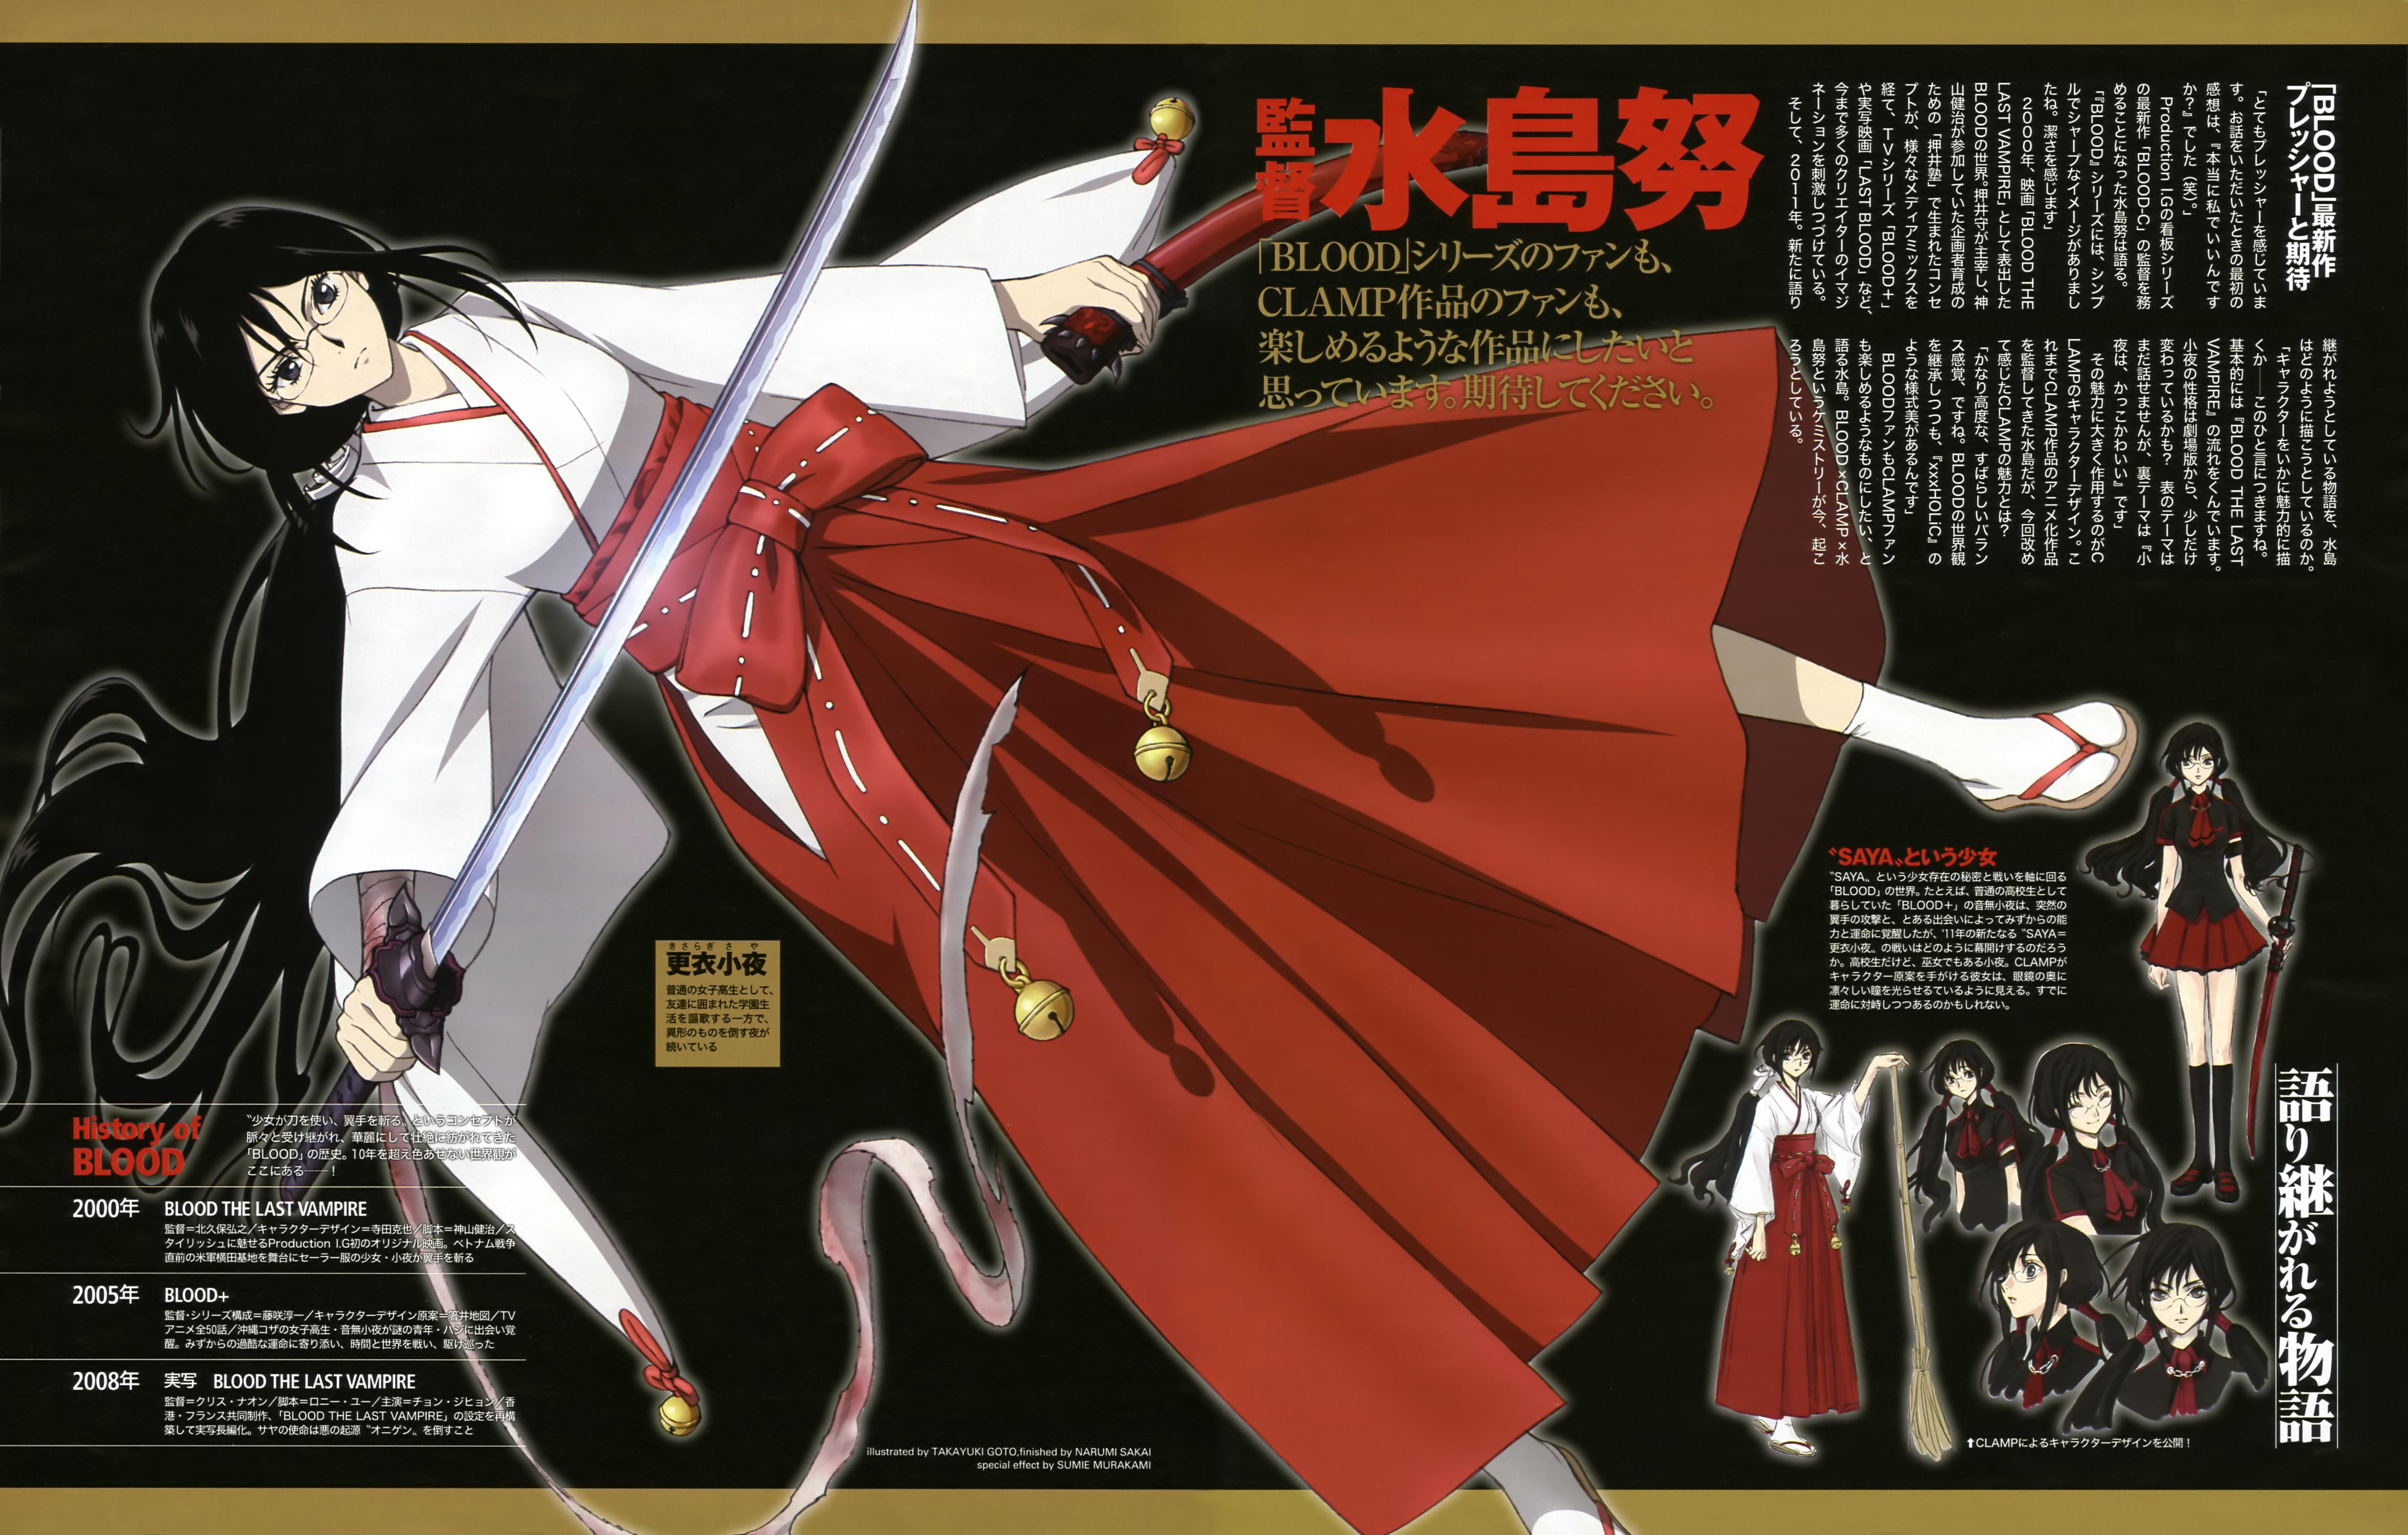 Tags: Scan, Sketch, Magazine (Source), Official Art, Blood-C, Gotou Takayuki, Kisaragi Saya